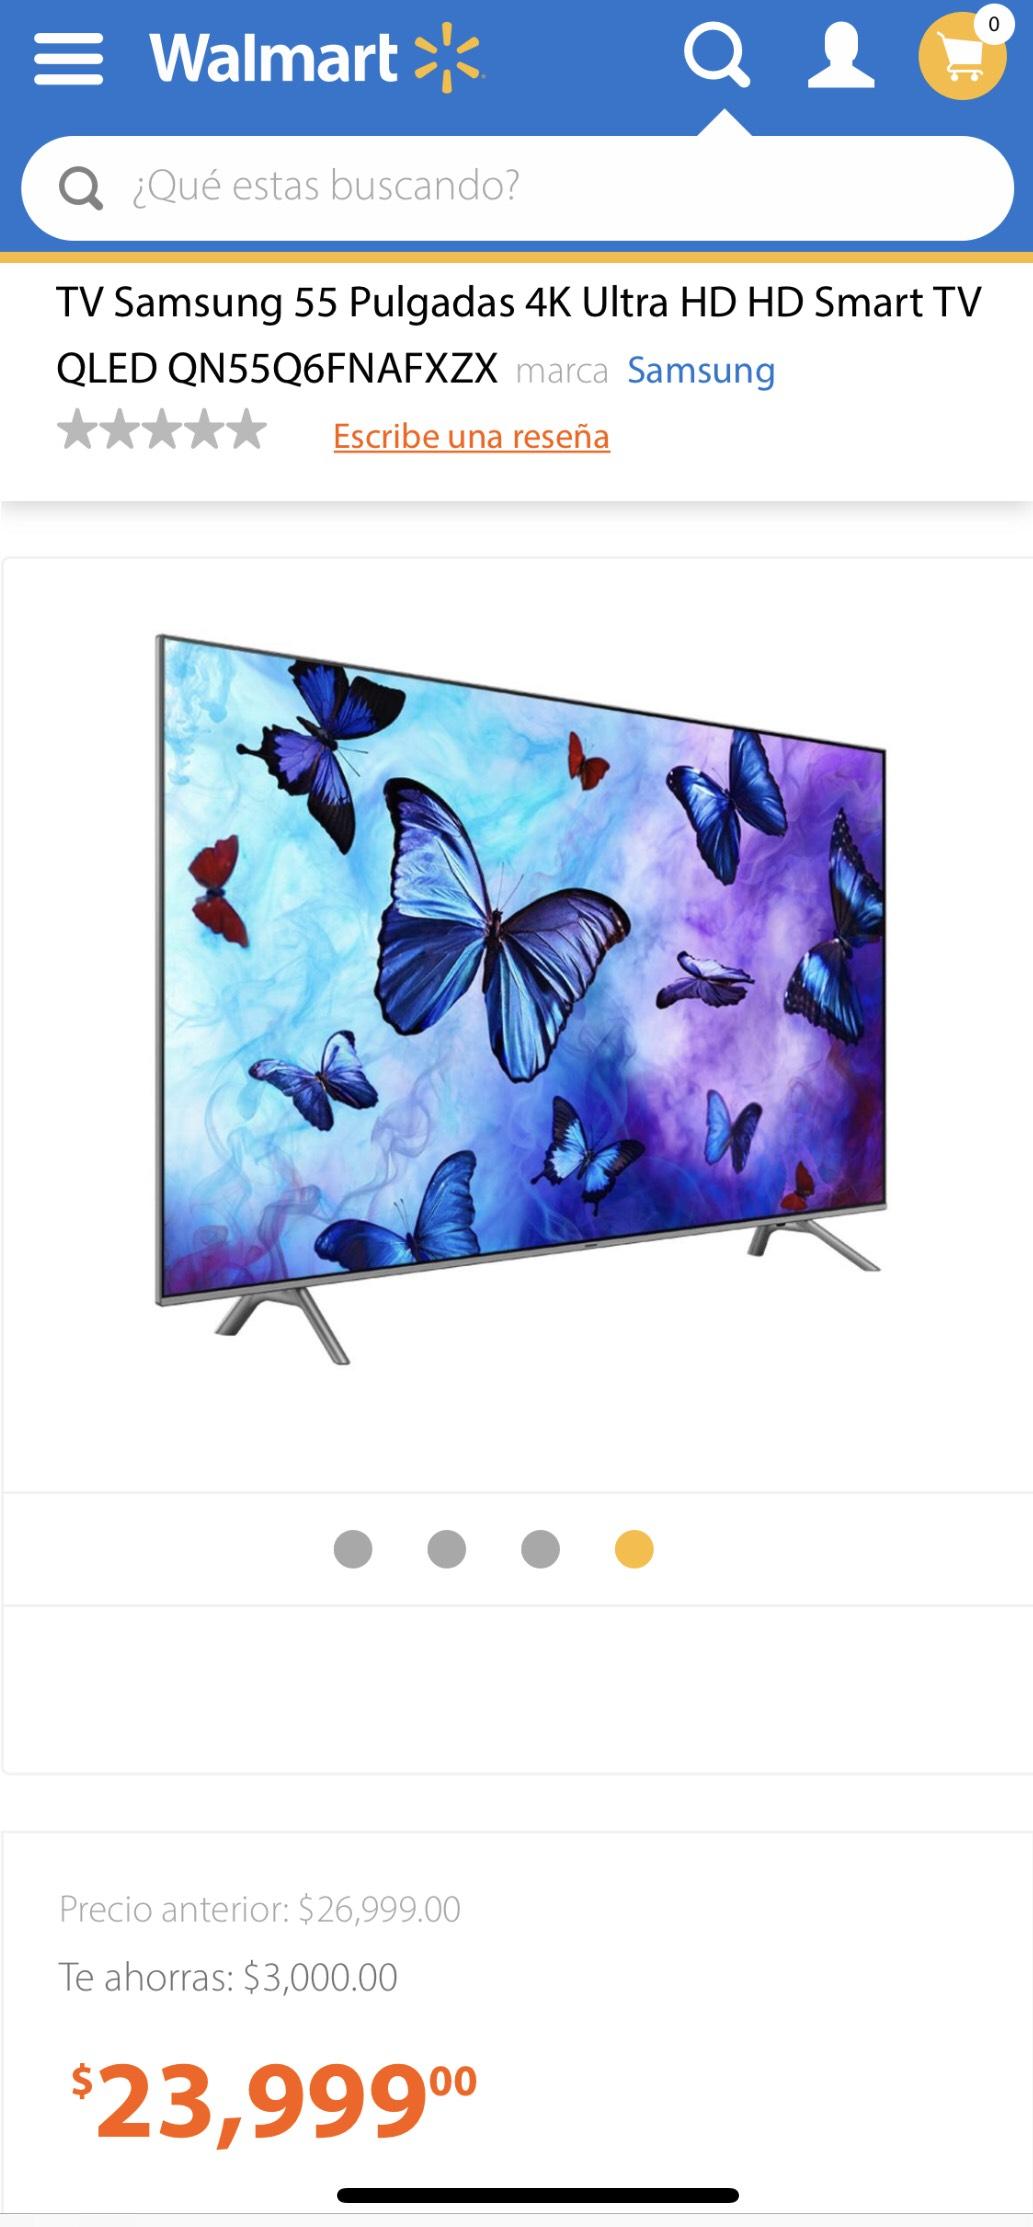 "Walmart: Pantalla Samsung 55"" 4K Ultra HD HD Smart TV QLED QN55Q6FNAFXZX 2018 (Pagando a 12 MSI con Citibanamex Pay)"